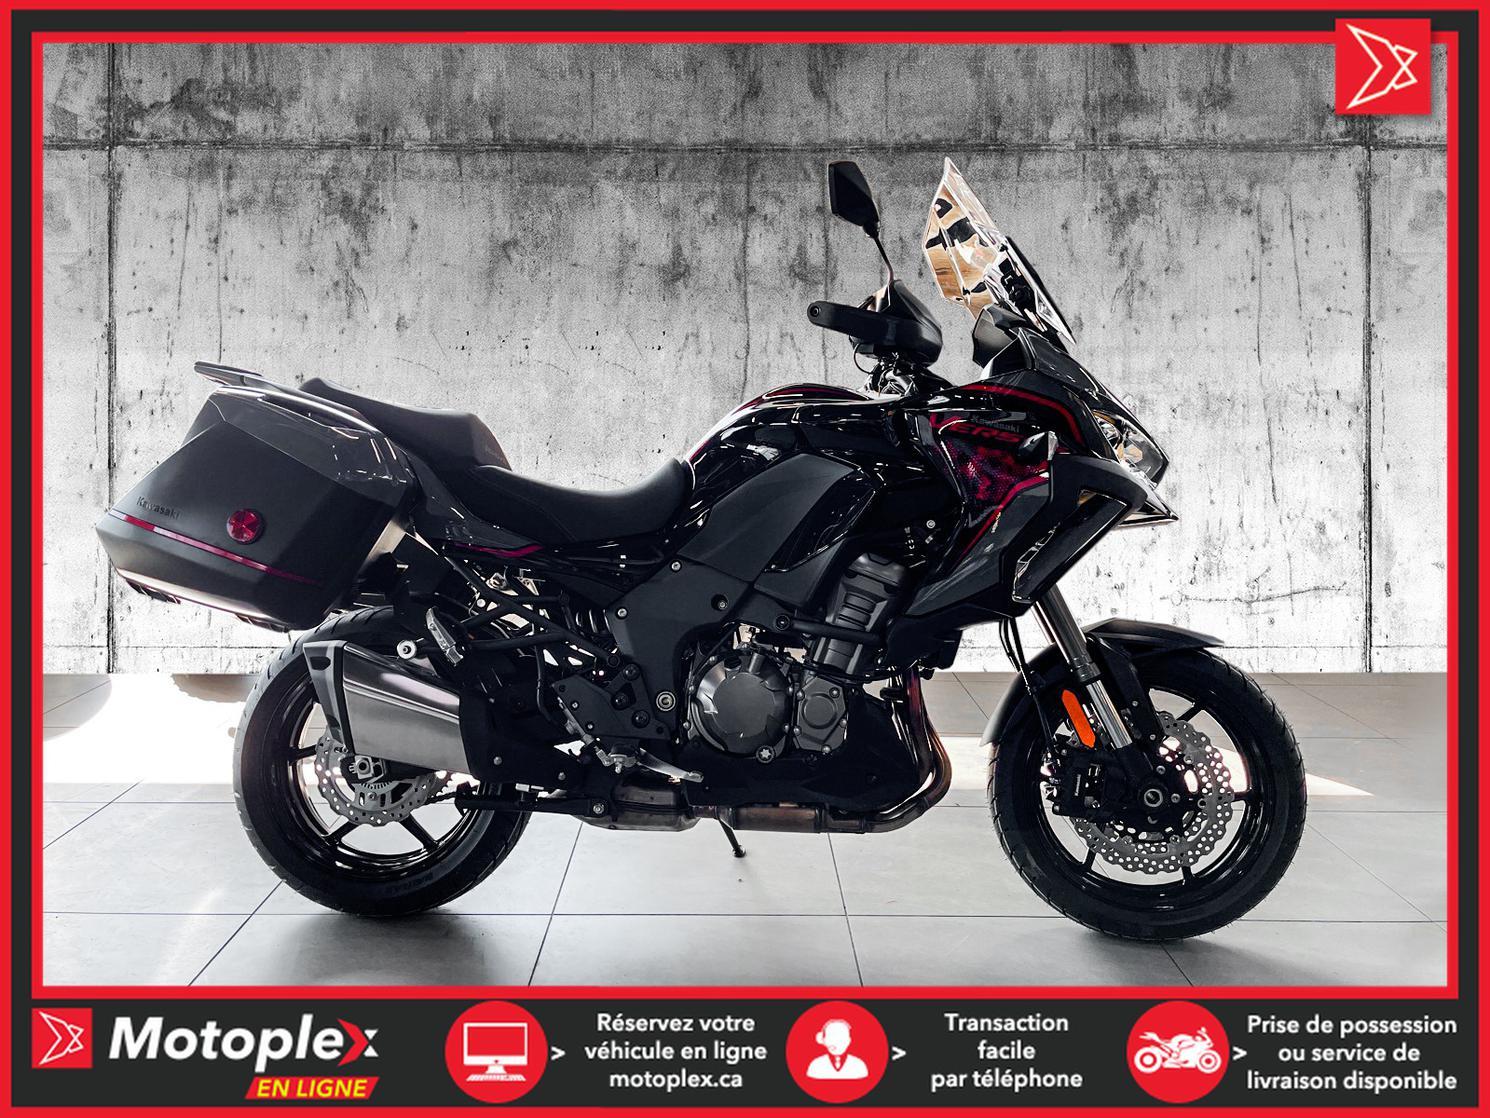 KW2120 Kawasaki VERSYS  1000 ABS LT SE 2021 2021